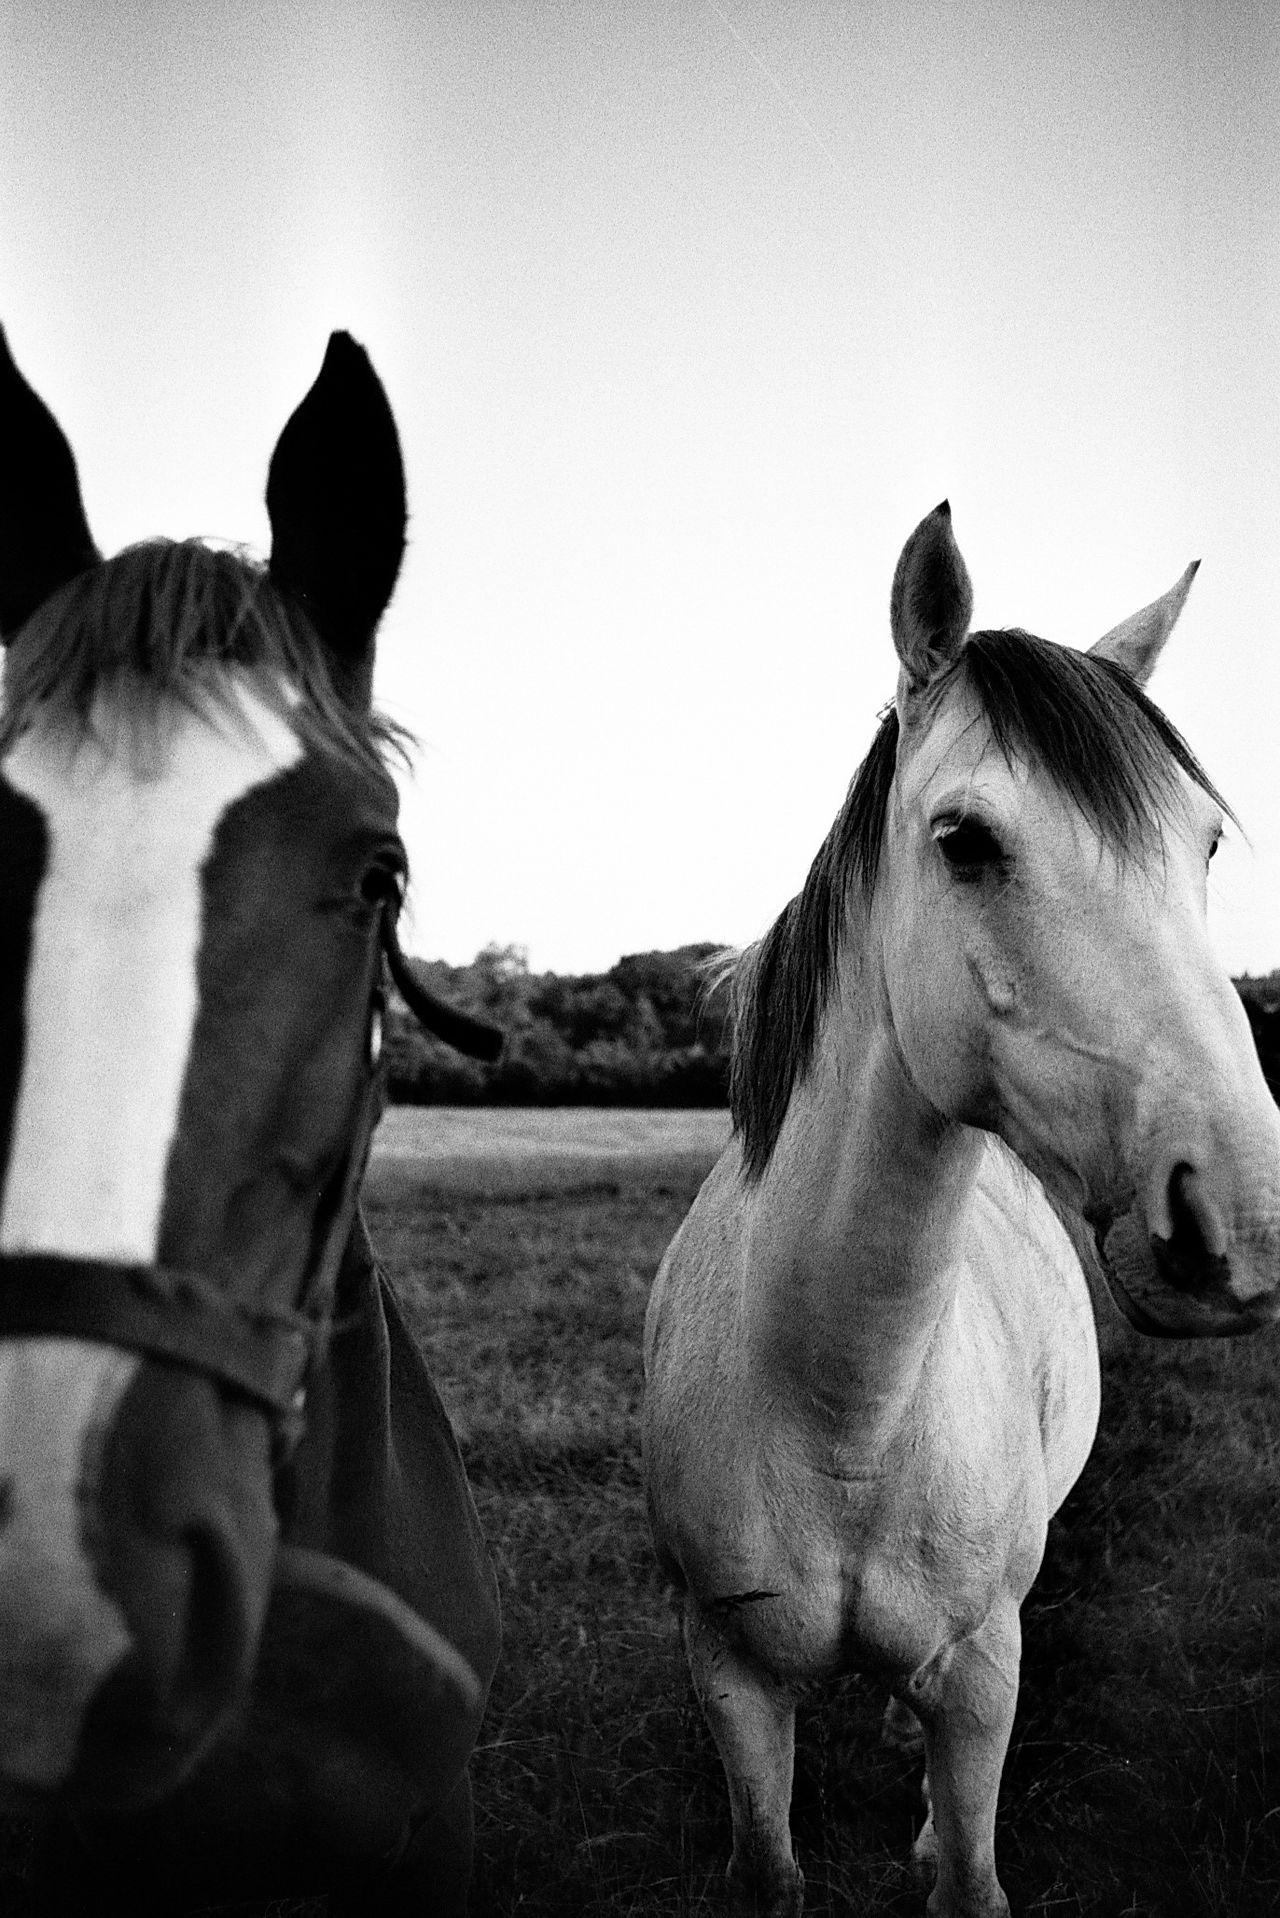 35mm 35mm Film Analogue Photography Animal Themes Blackandwhite Brother Film Film Photography Filmisnotdead Horse Ishootfilm Portrait